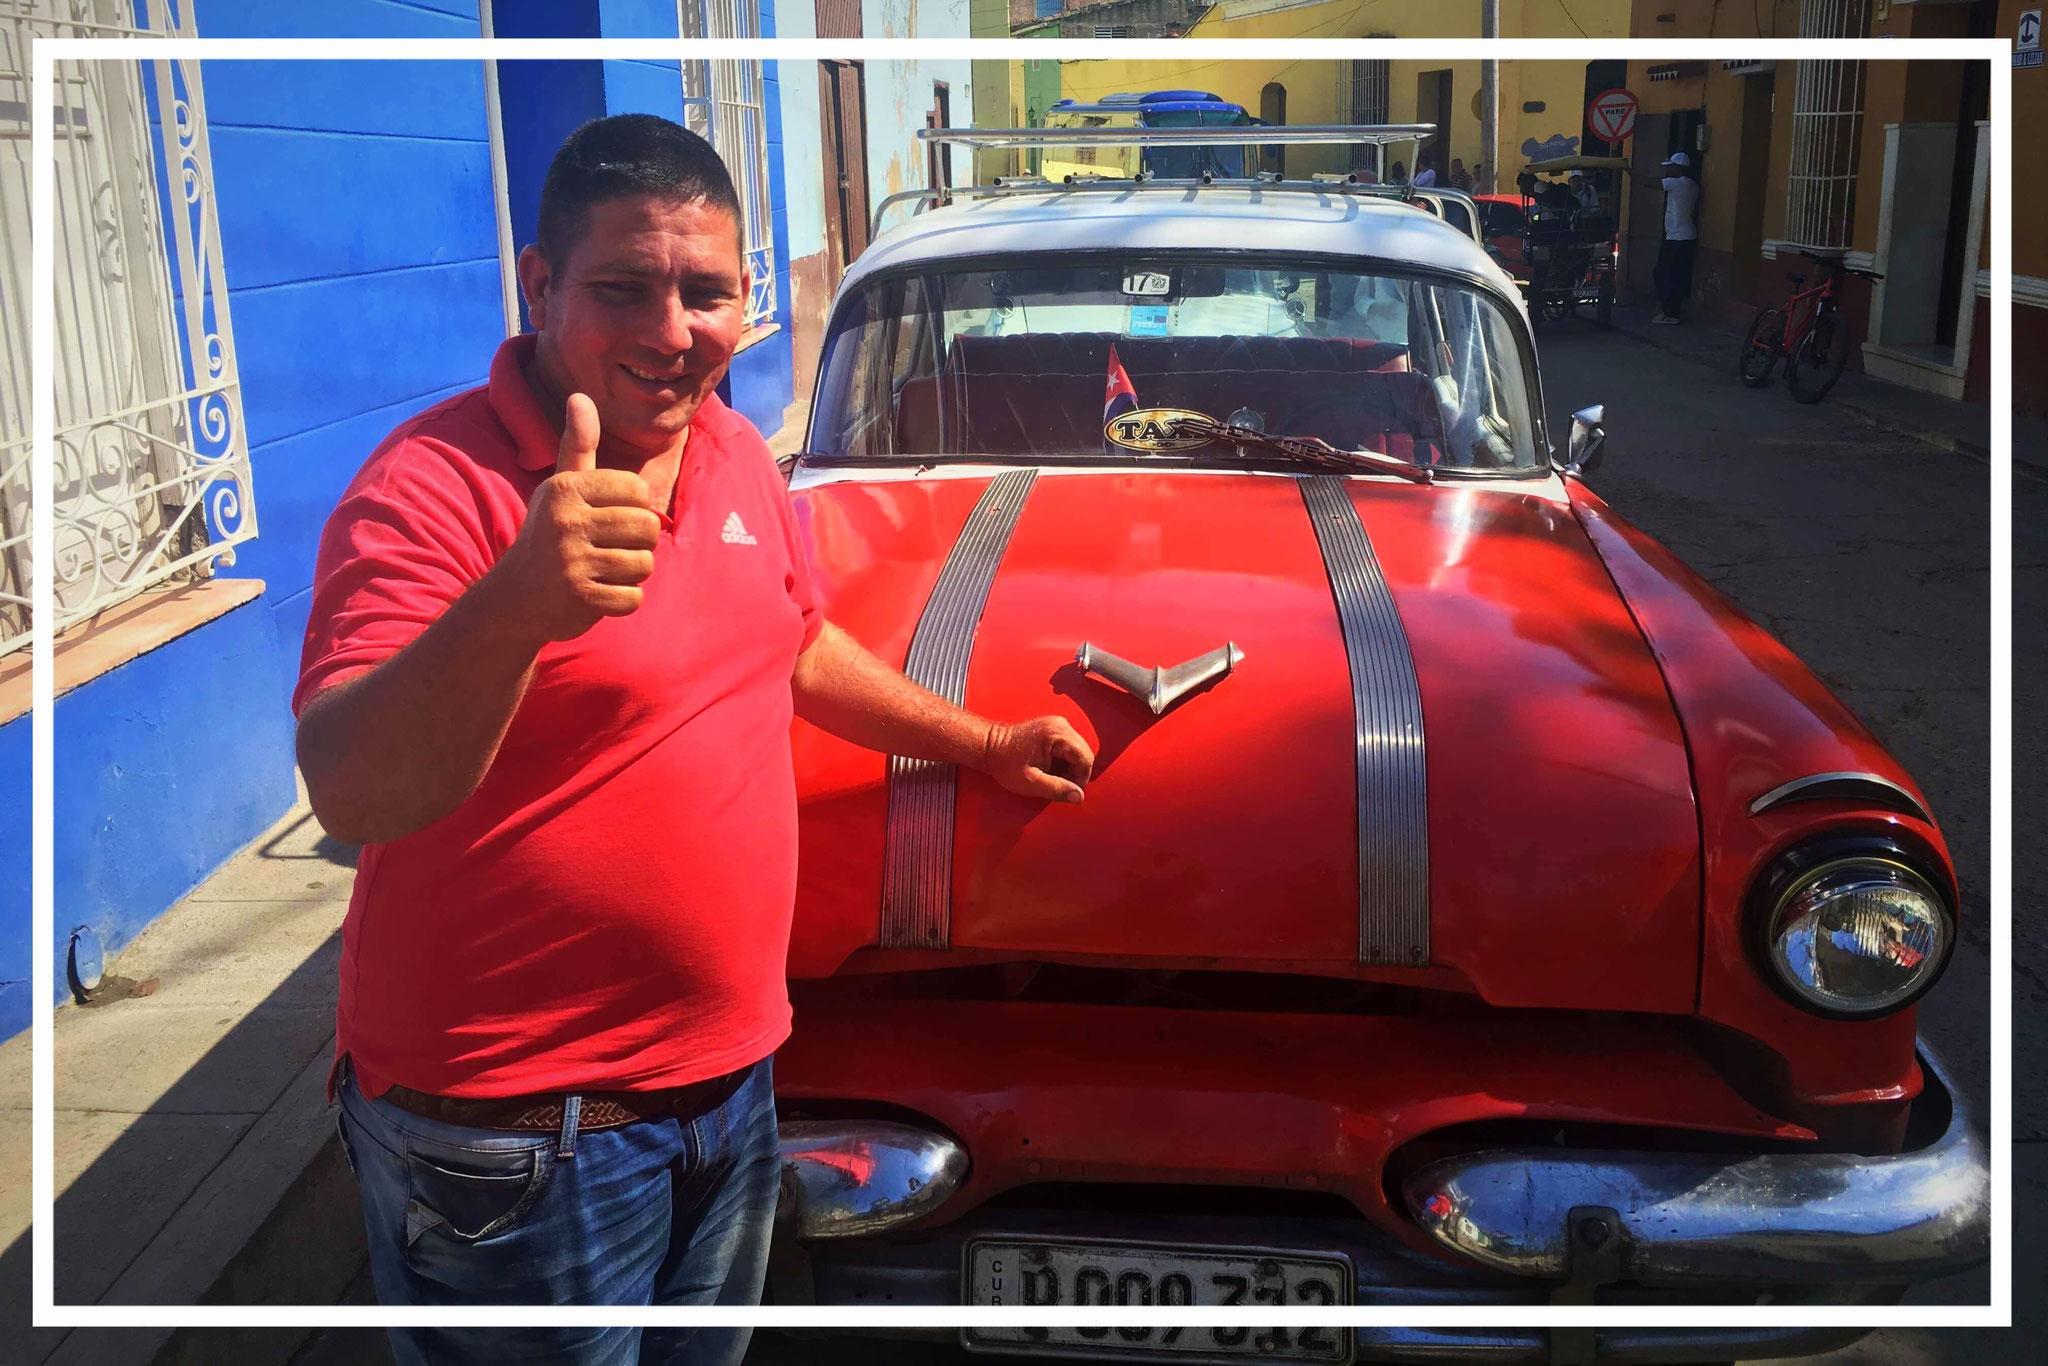 Nelson - stolzer Taxifahrer aus Kuba